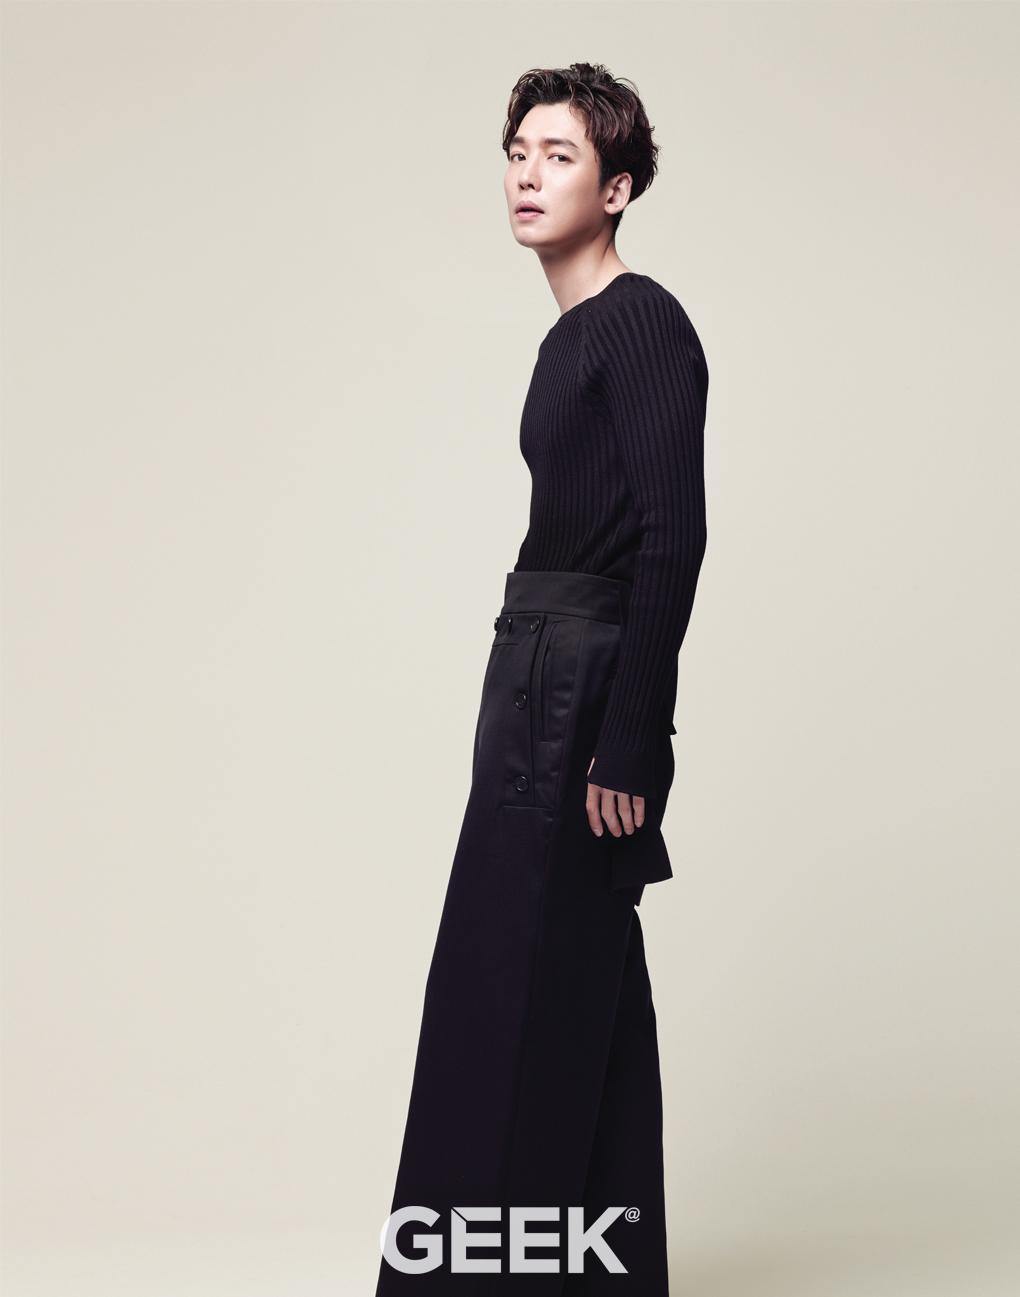 Jeong Kyeongho, Actor on Geek Mag.